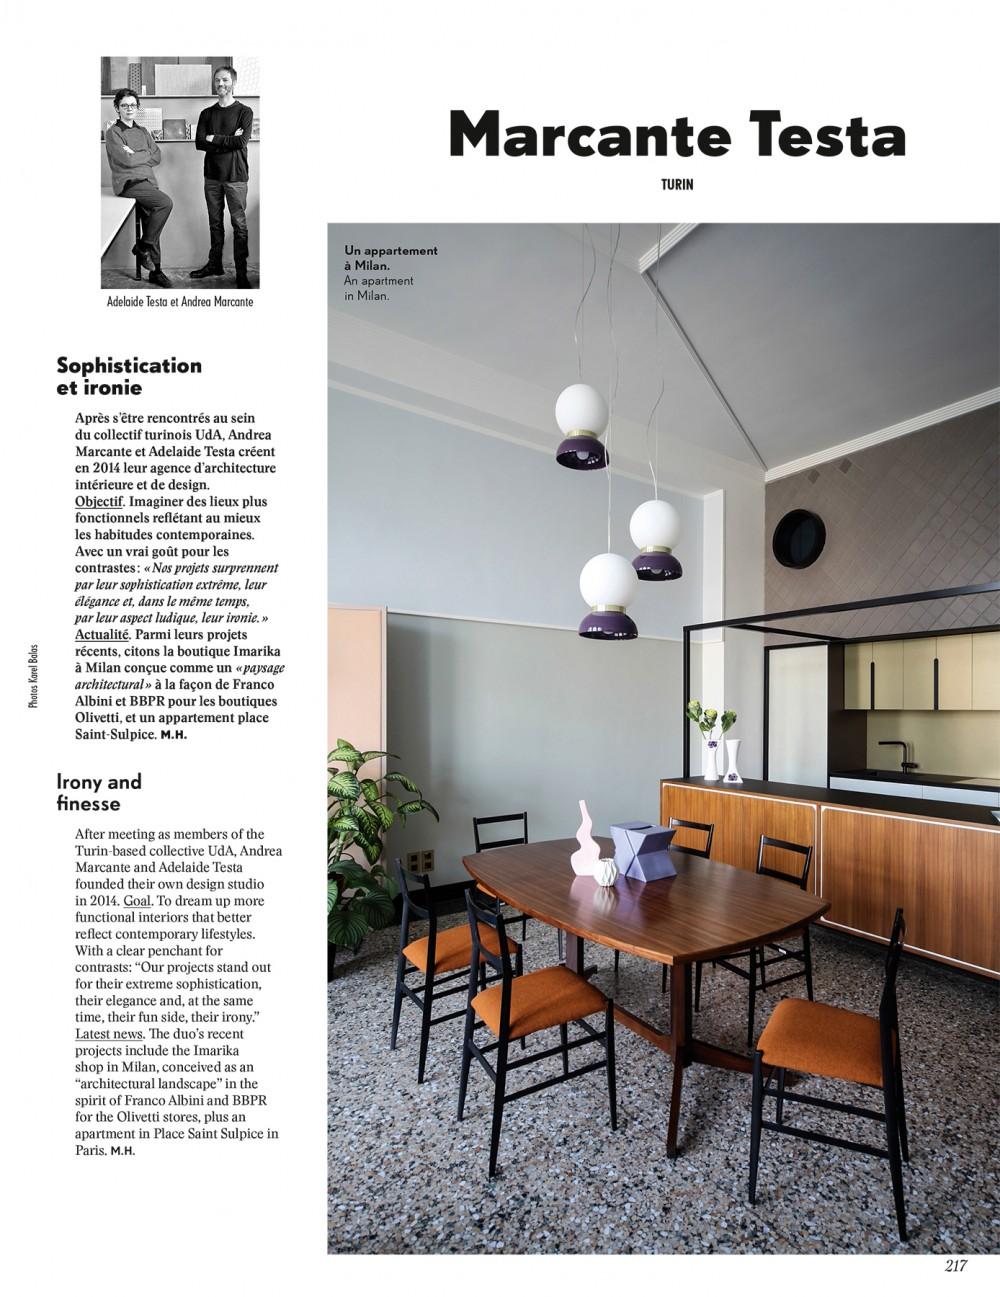 Marcante Testa Among The Top 100 Interior Designers On Ad Collector 2019 Marcante Testa Architetti